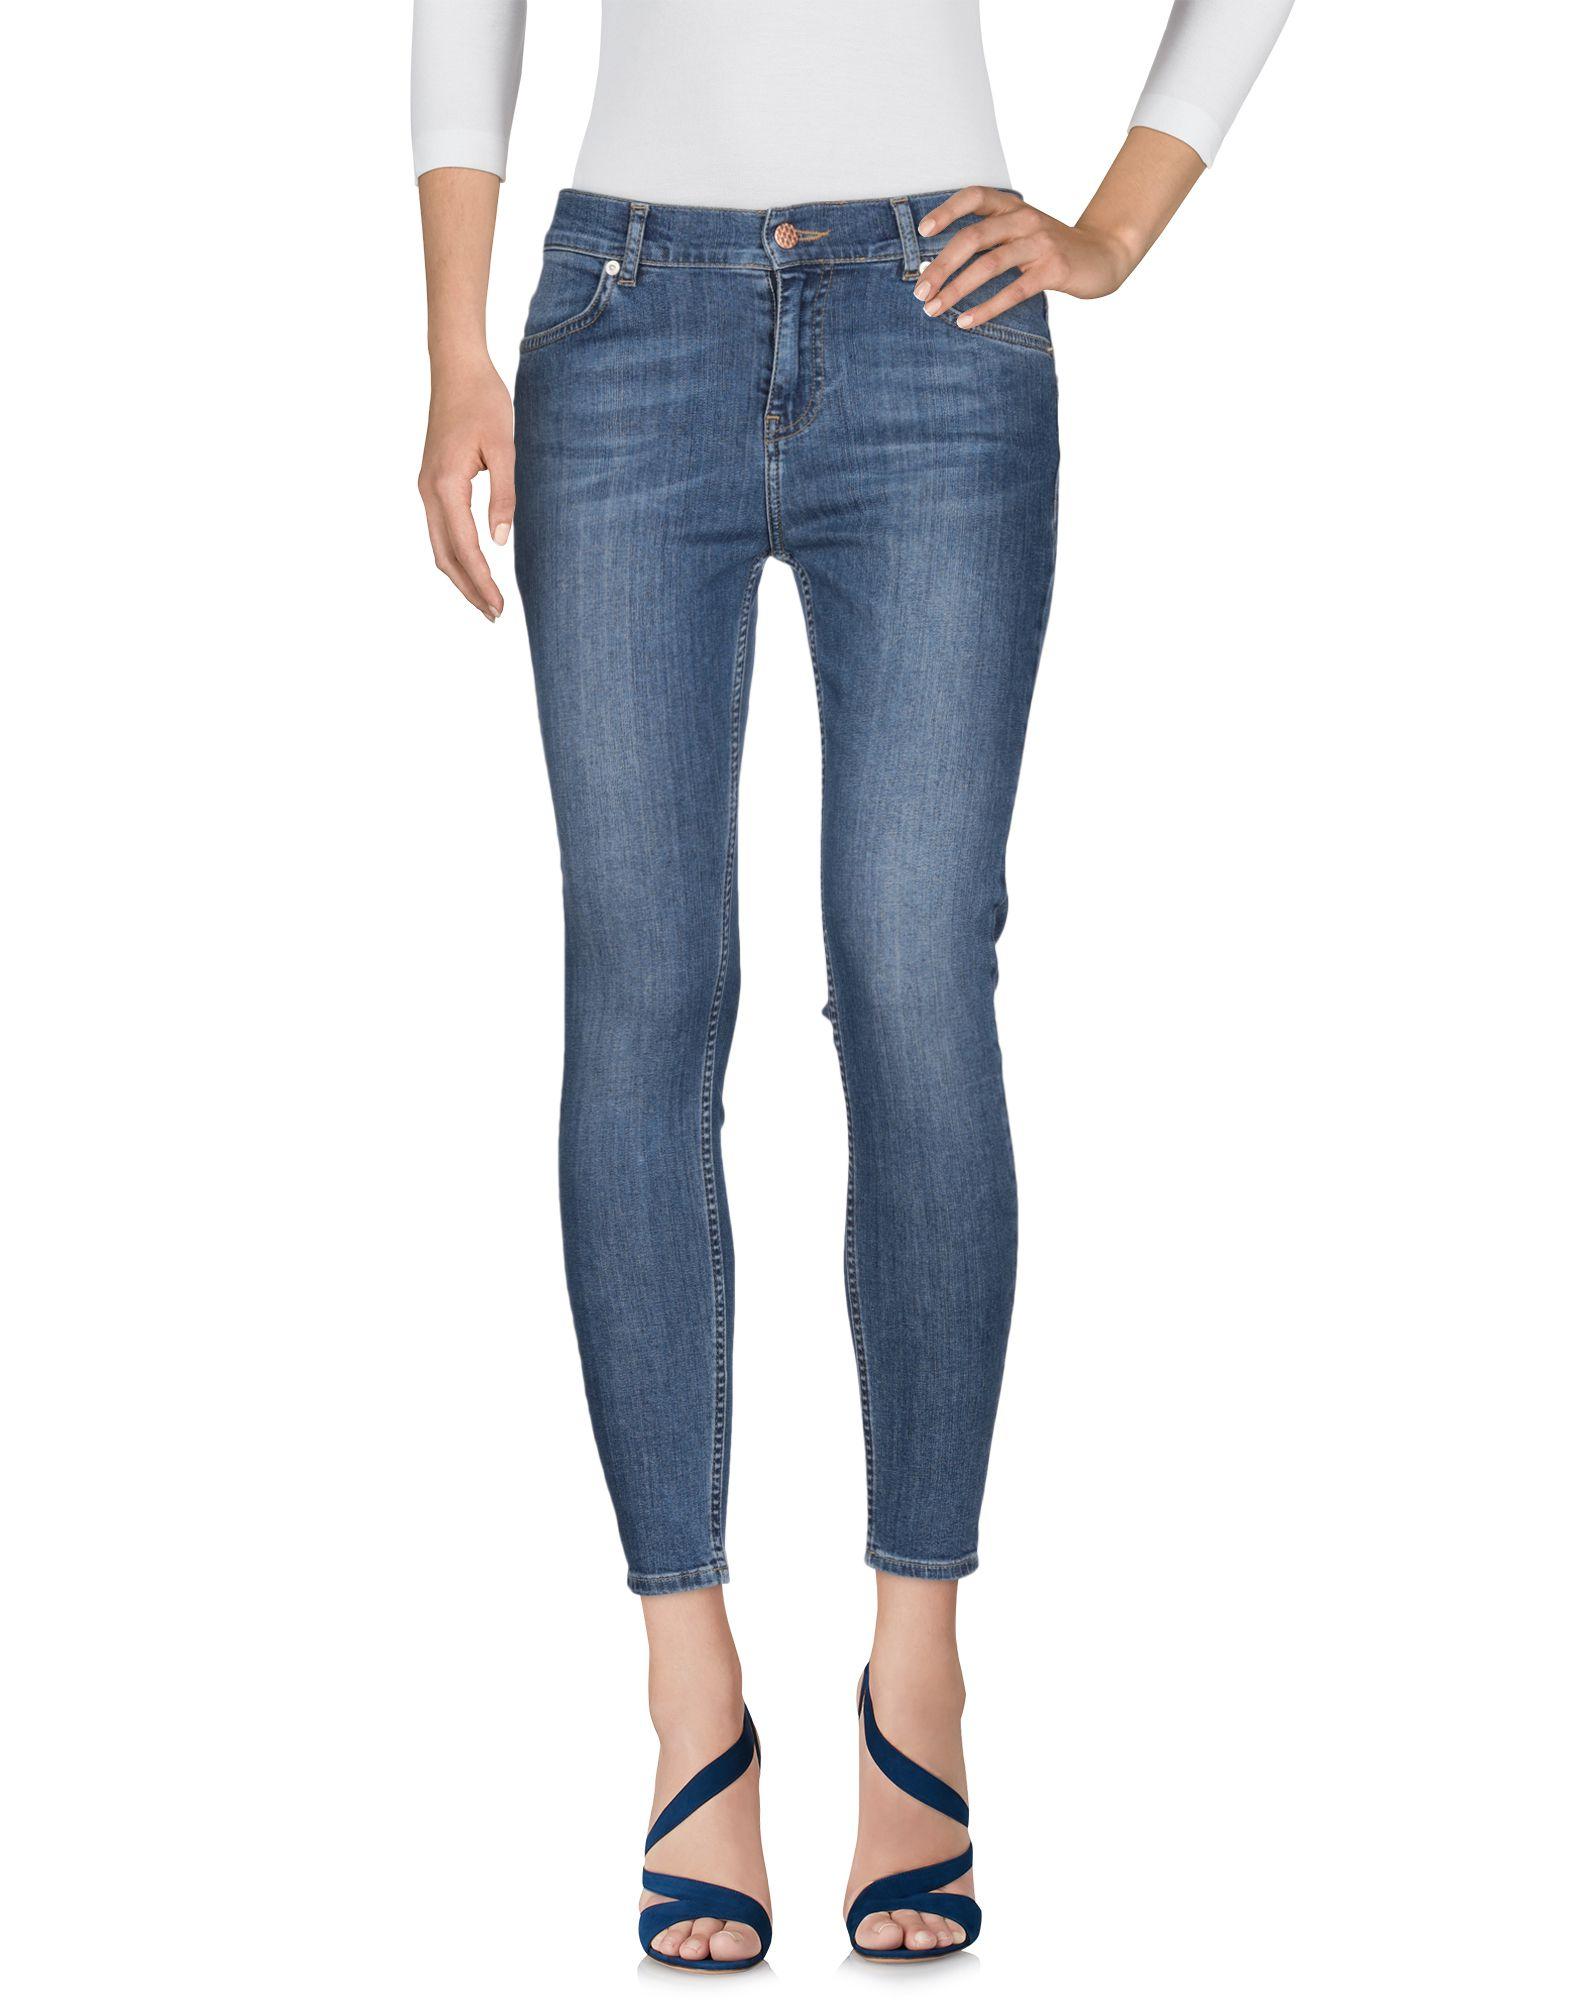 Pantaloni Pantaloni Jeans Junkyard. donna - 42688531RE  mehr Rabatt